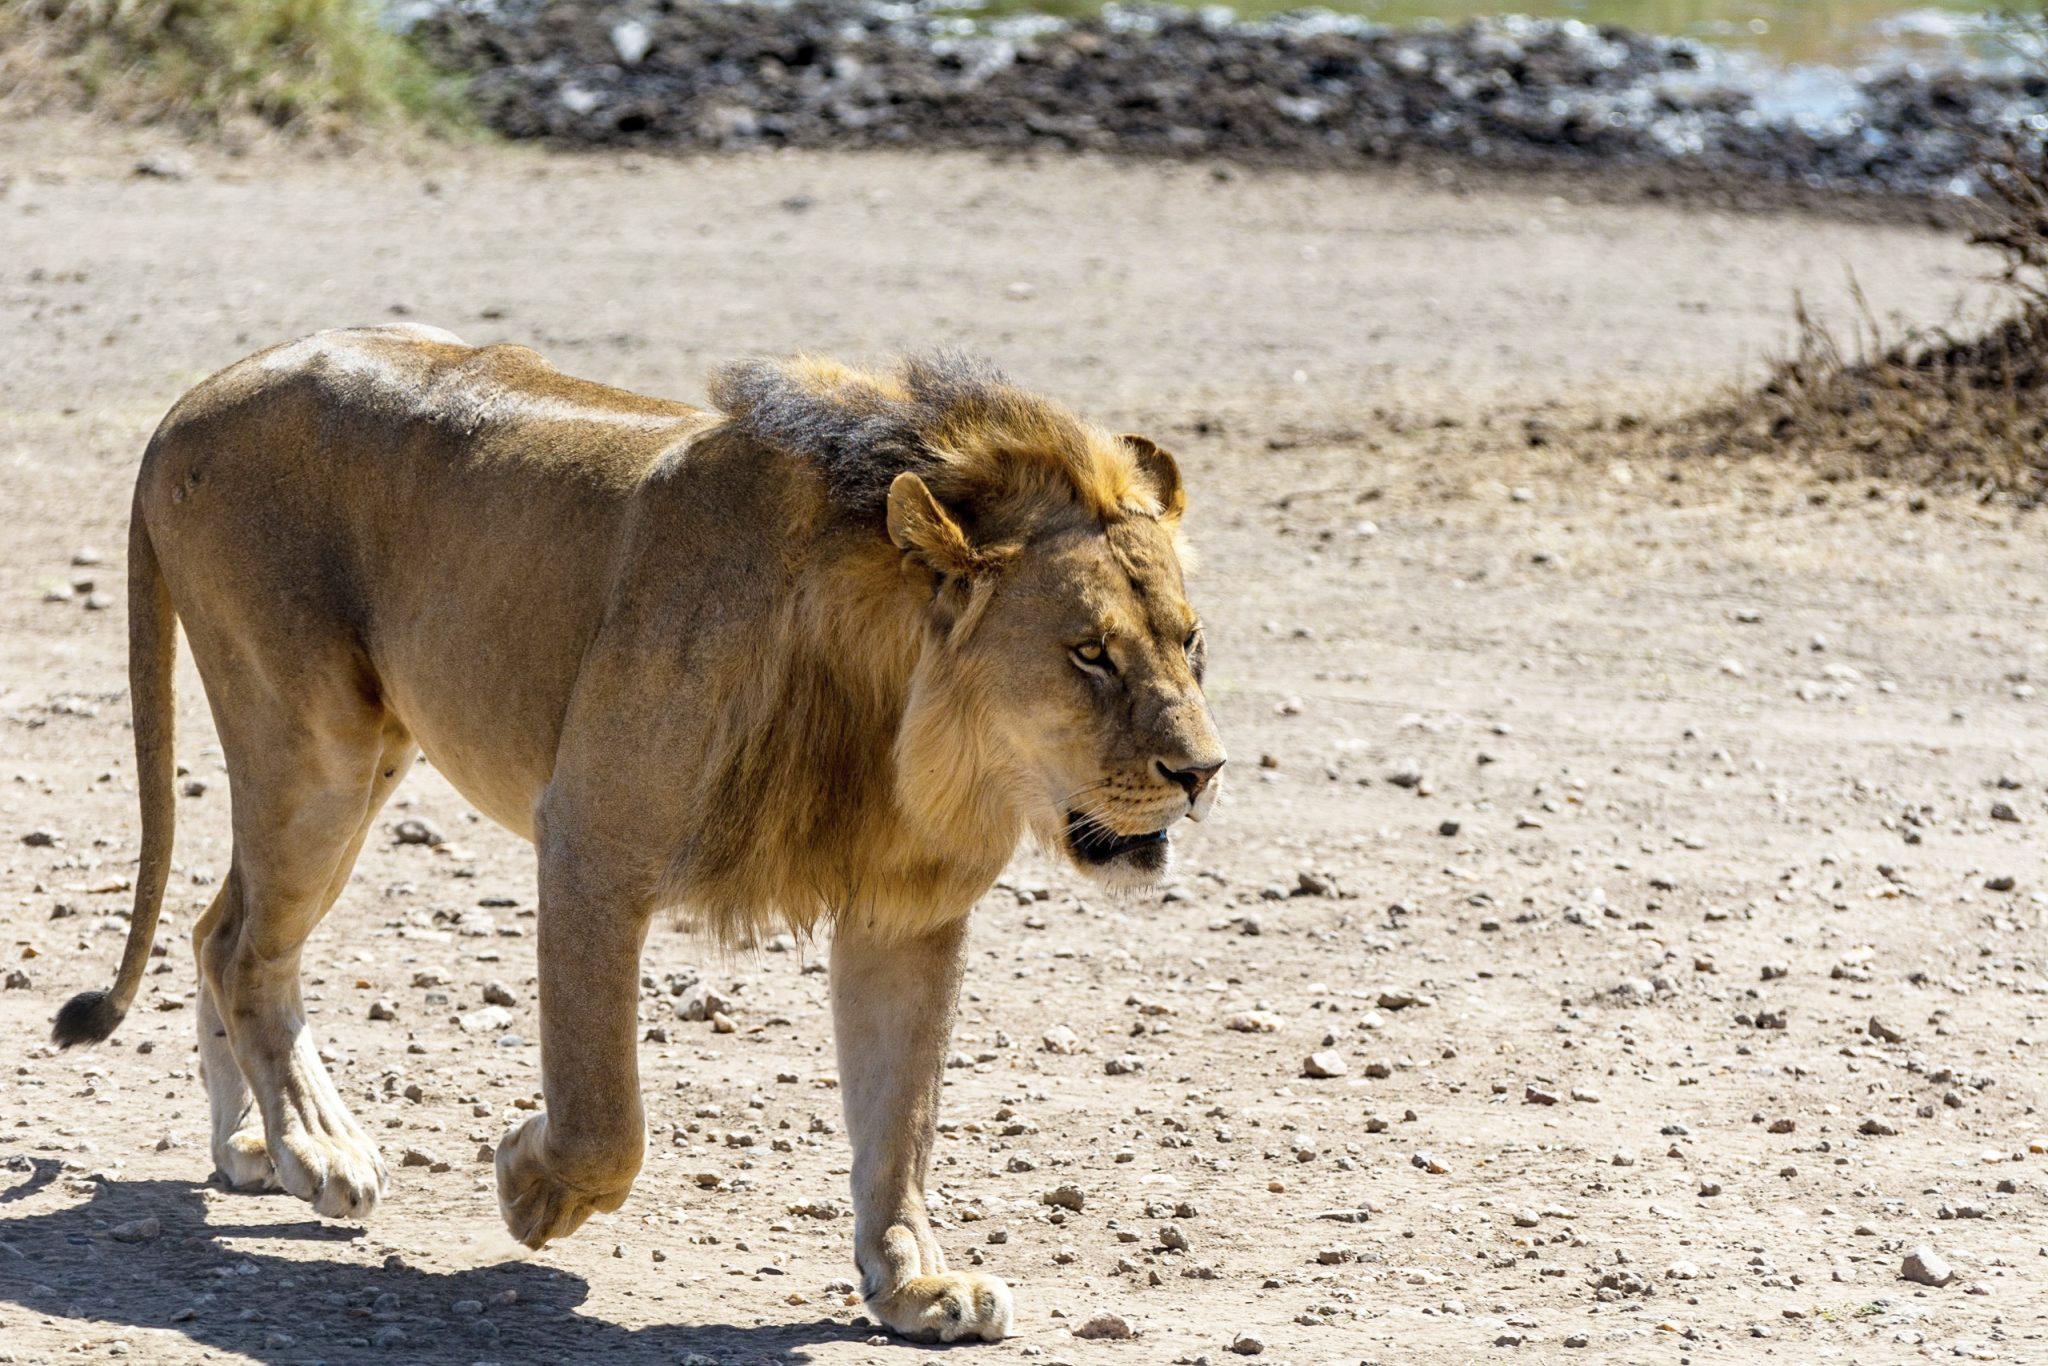 https://www.safariventures.com/wp-content/uploads/2019/01/untitled-73913904.jpg